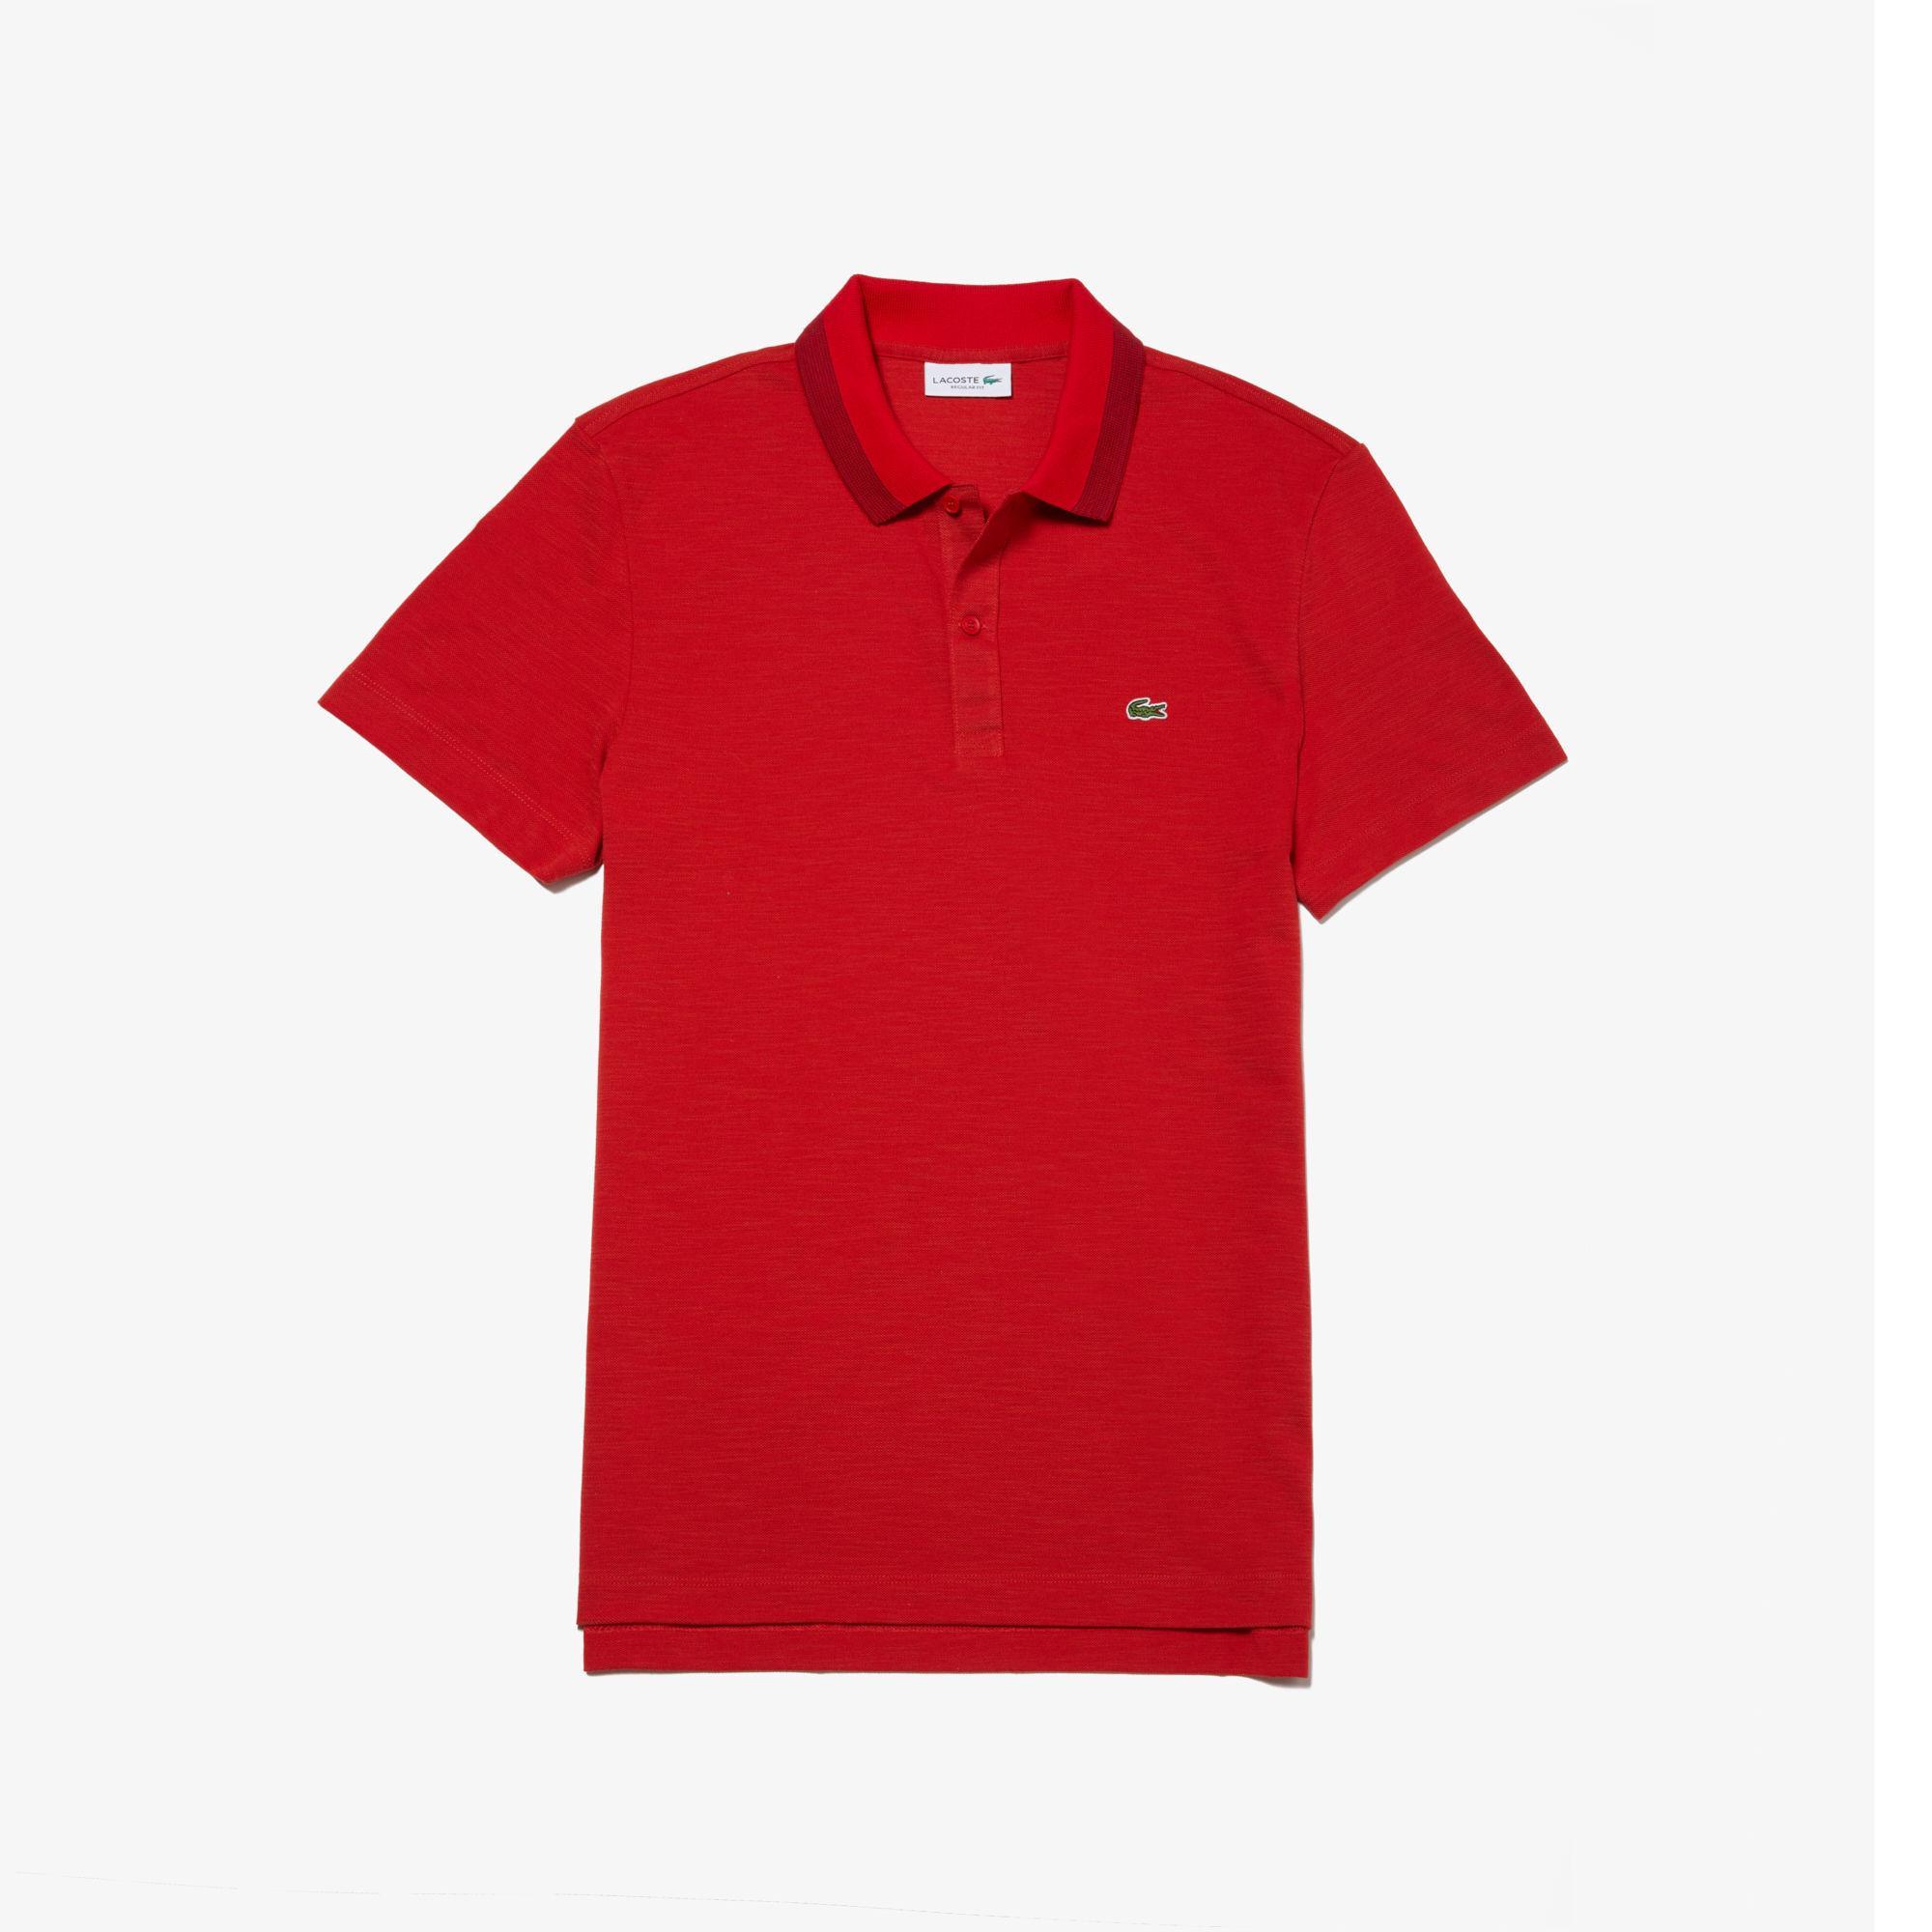 91de1f63a2eec Lacoste - Red Regular Fit Piqué Polo Shirt for Men - Lyst. View fullscreen